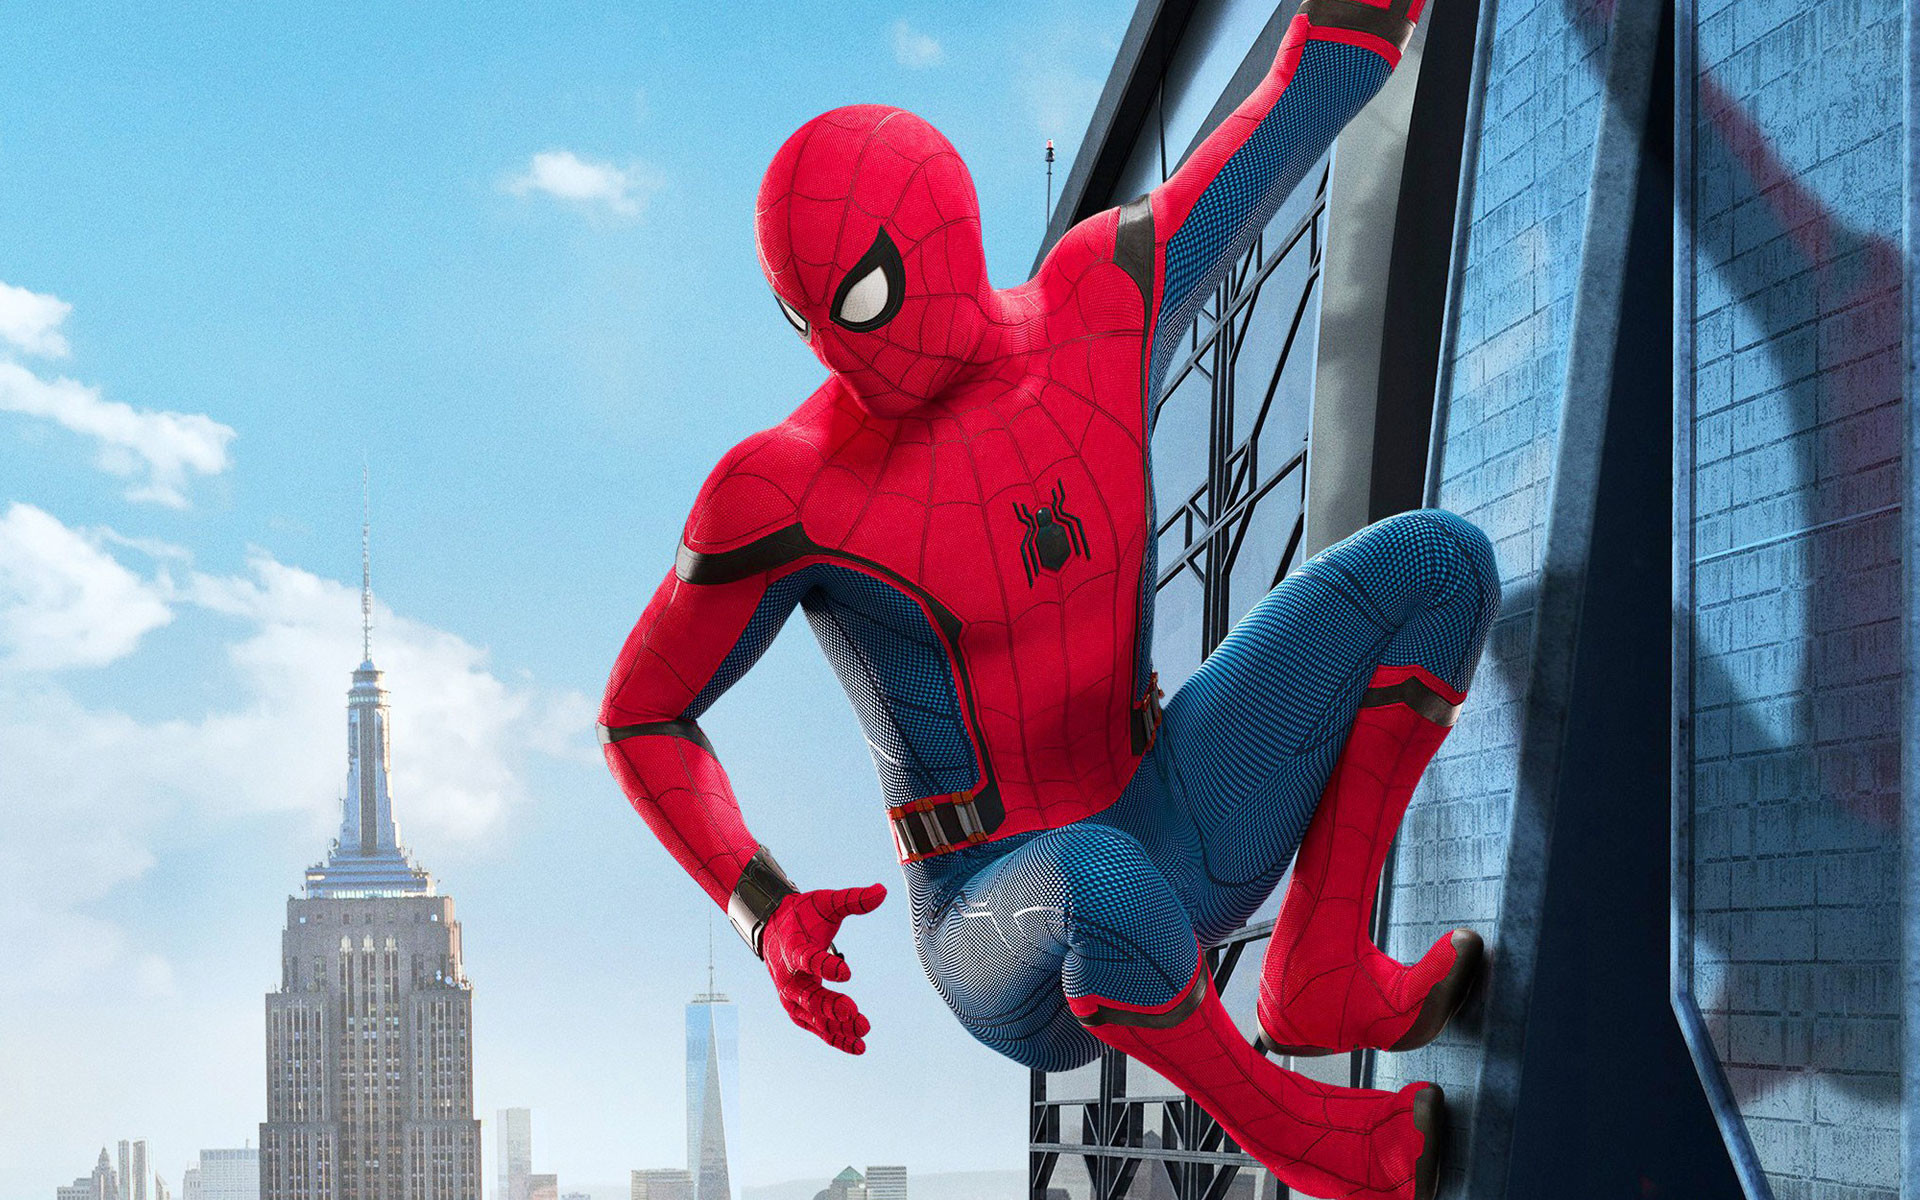 … 2017-Spiderman-Homecoming-wallpaper-hd …